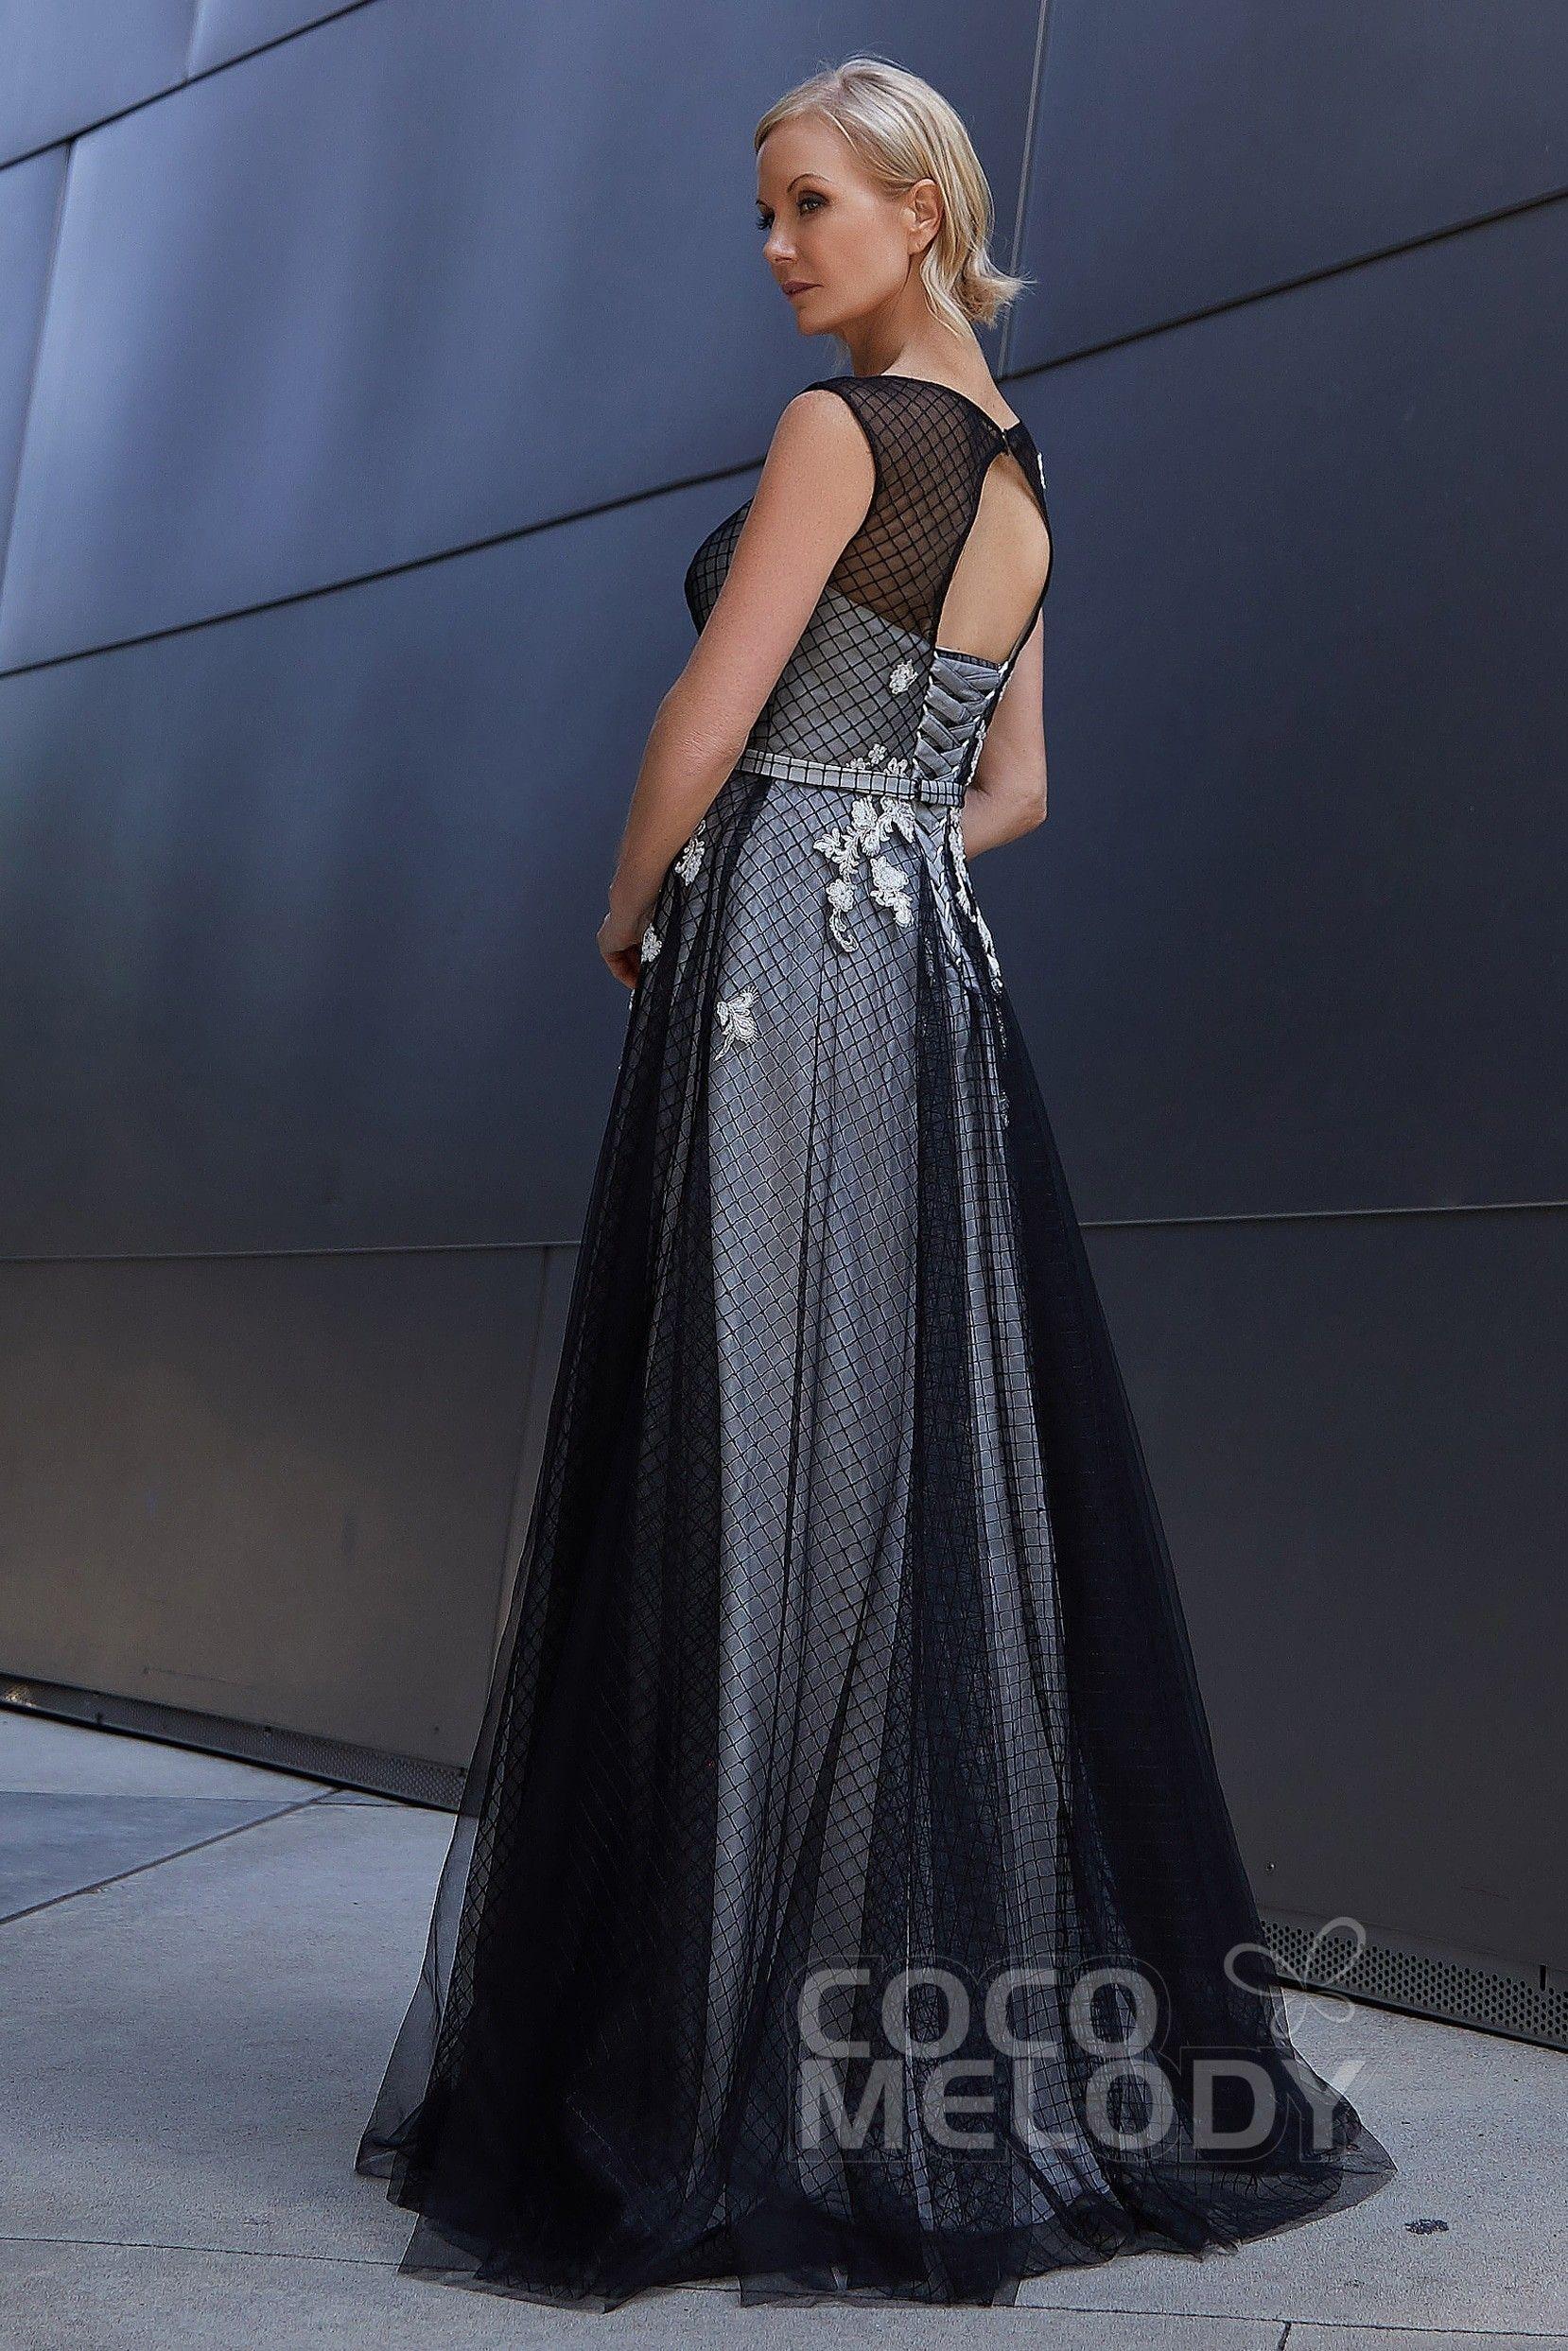 Usd 259 A Line V Neck Cap Sleeve Lace Up Corset Dress Pr3610 Corset Dress Dresses Mother Of The Bride Dresses [ 2486 x 1658 Pixel ]